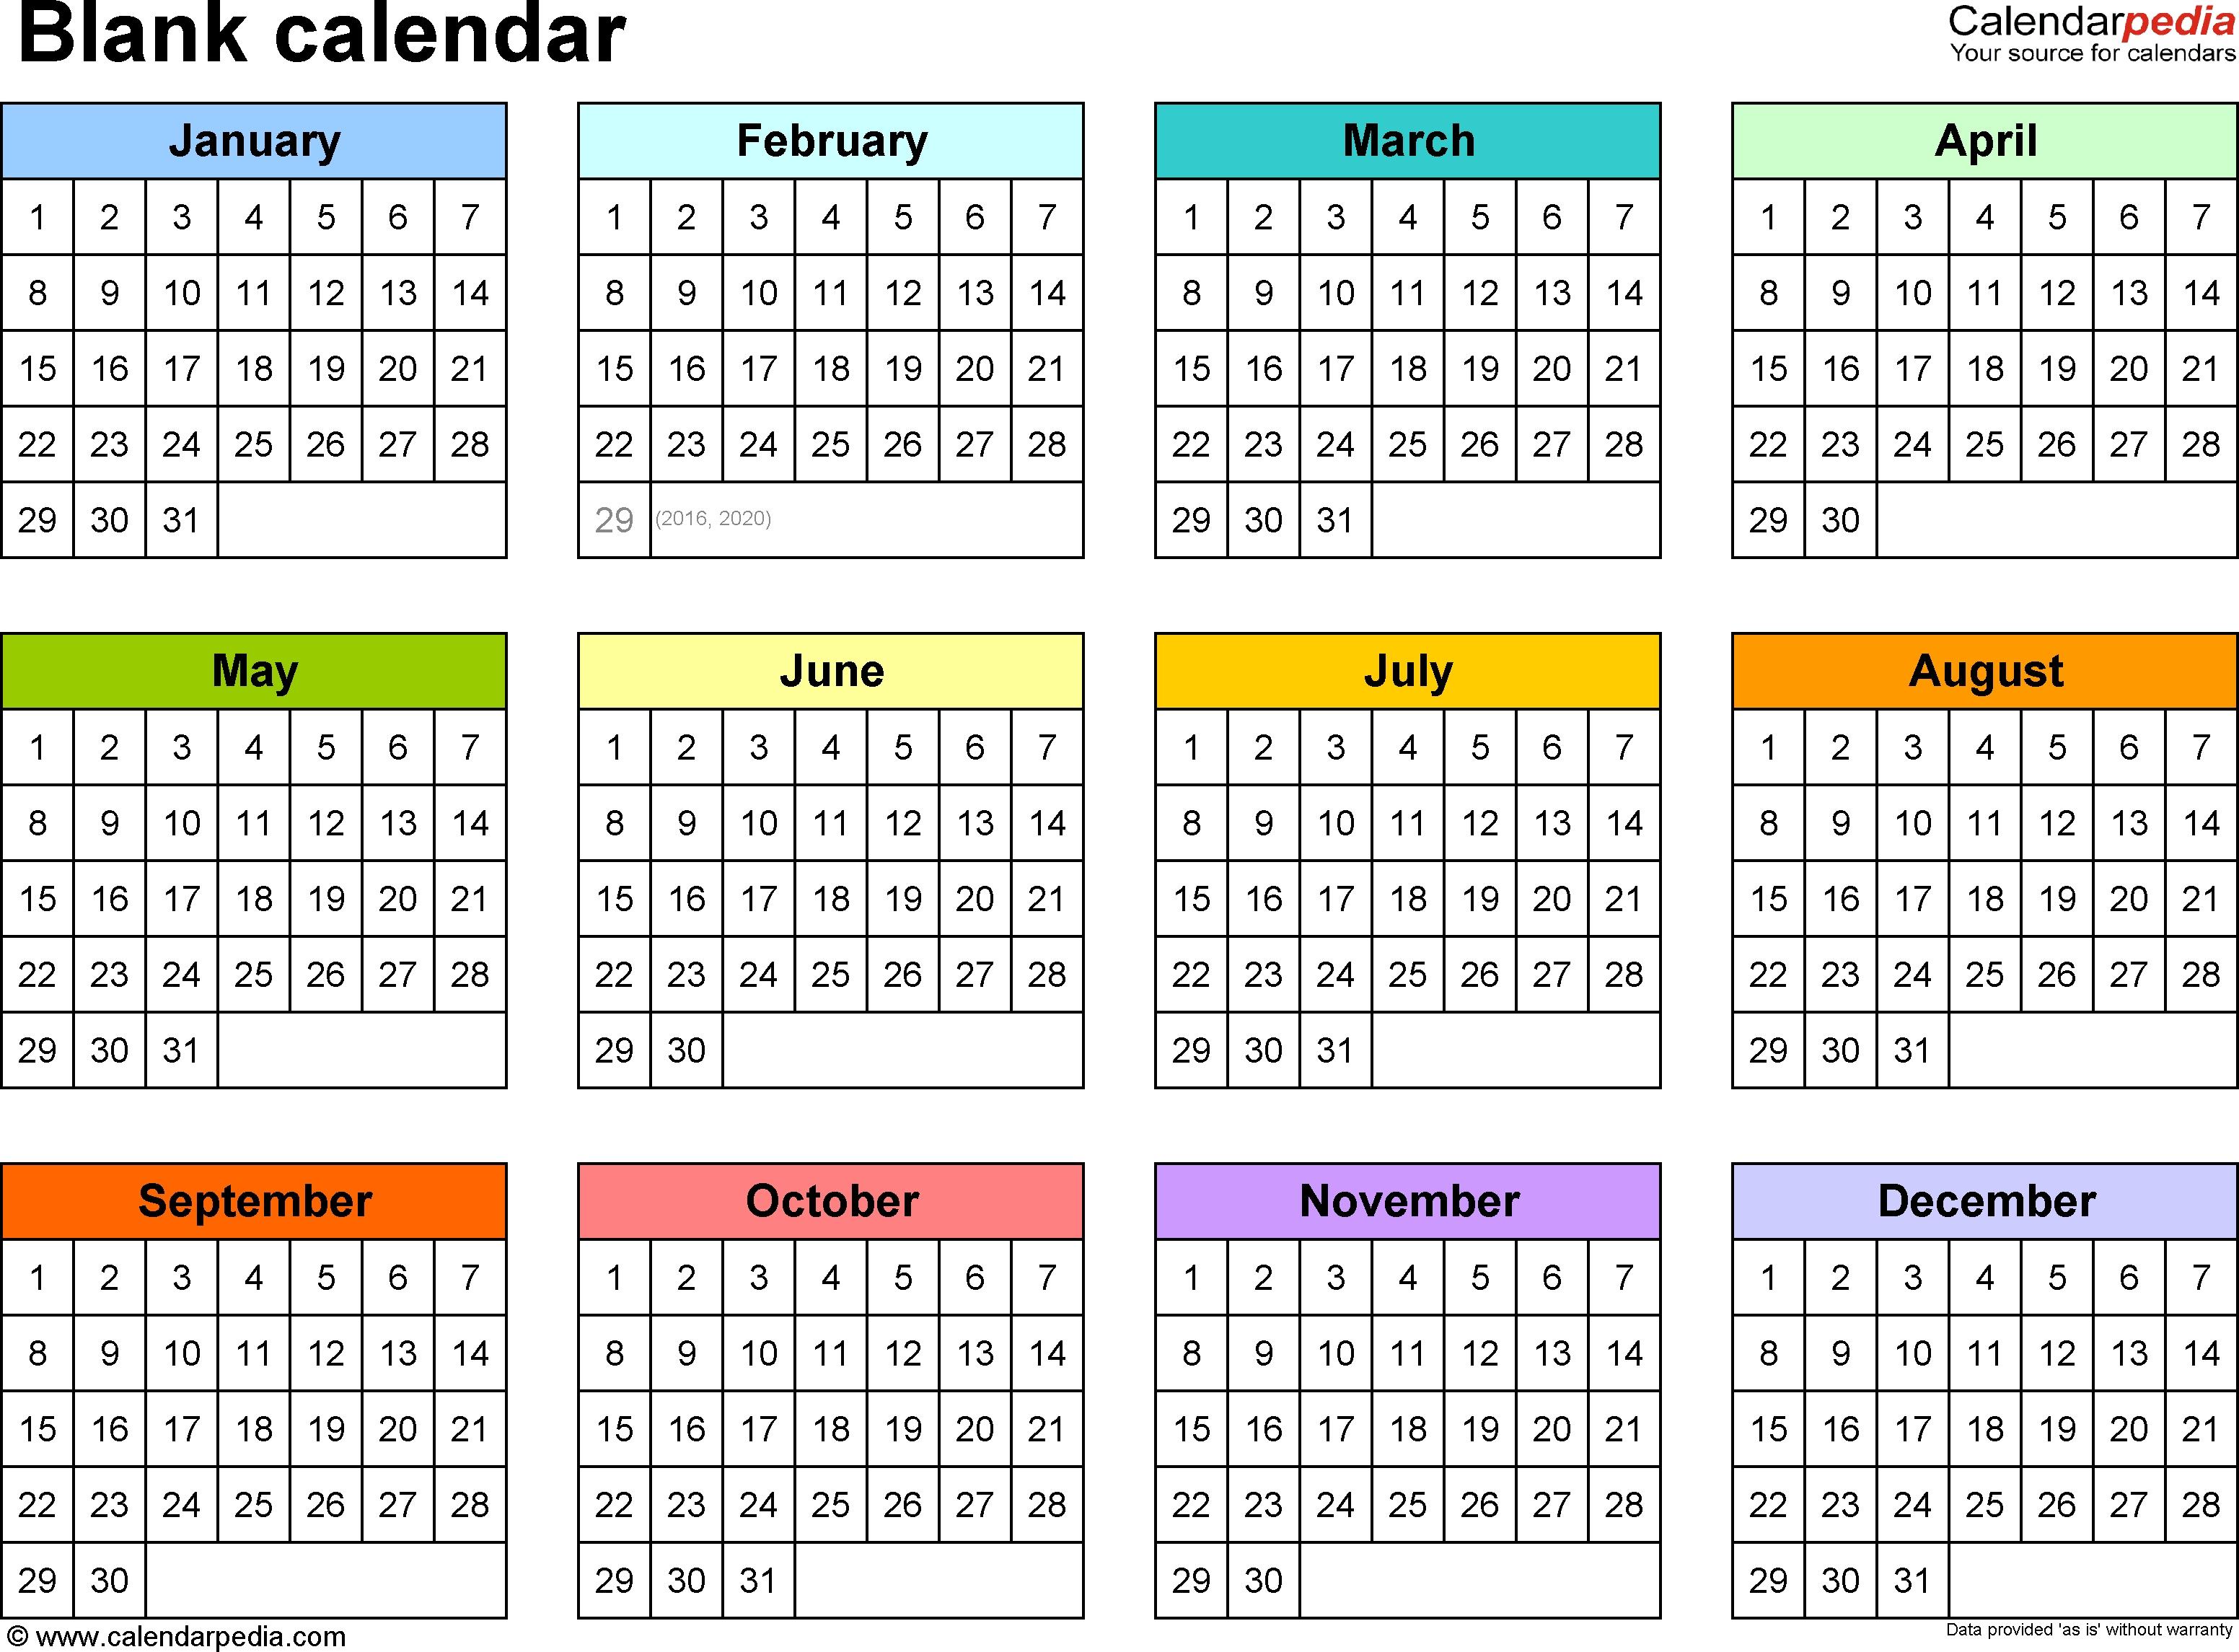 Blank Calendar - 9 Free Printable Microsoft Word Templates  Free Printable 12 Month Blank Calendar